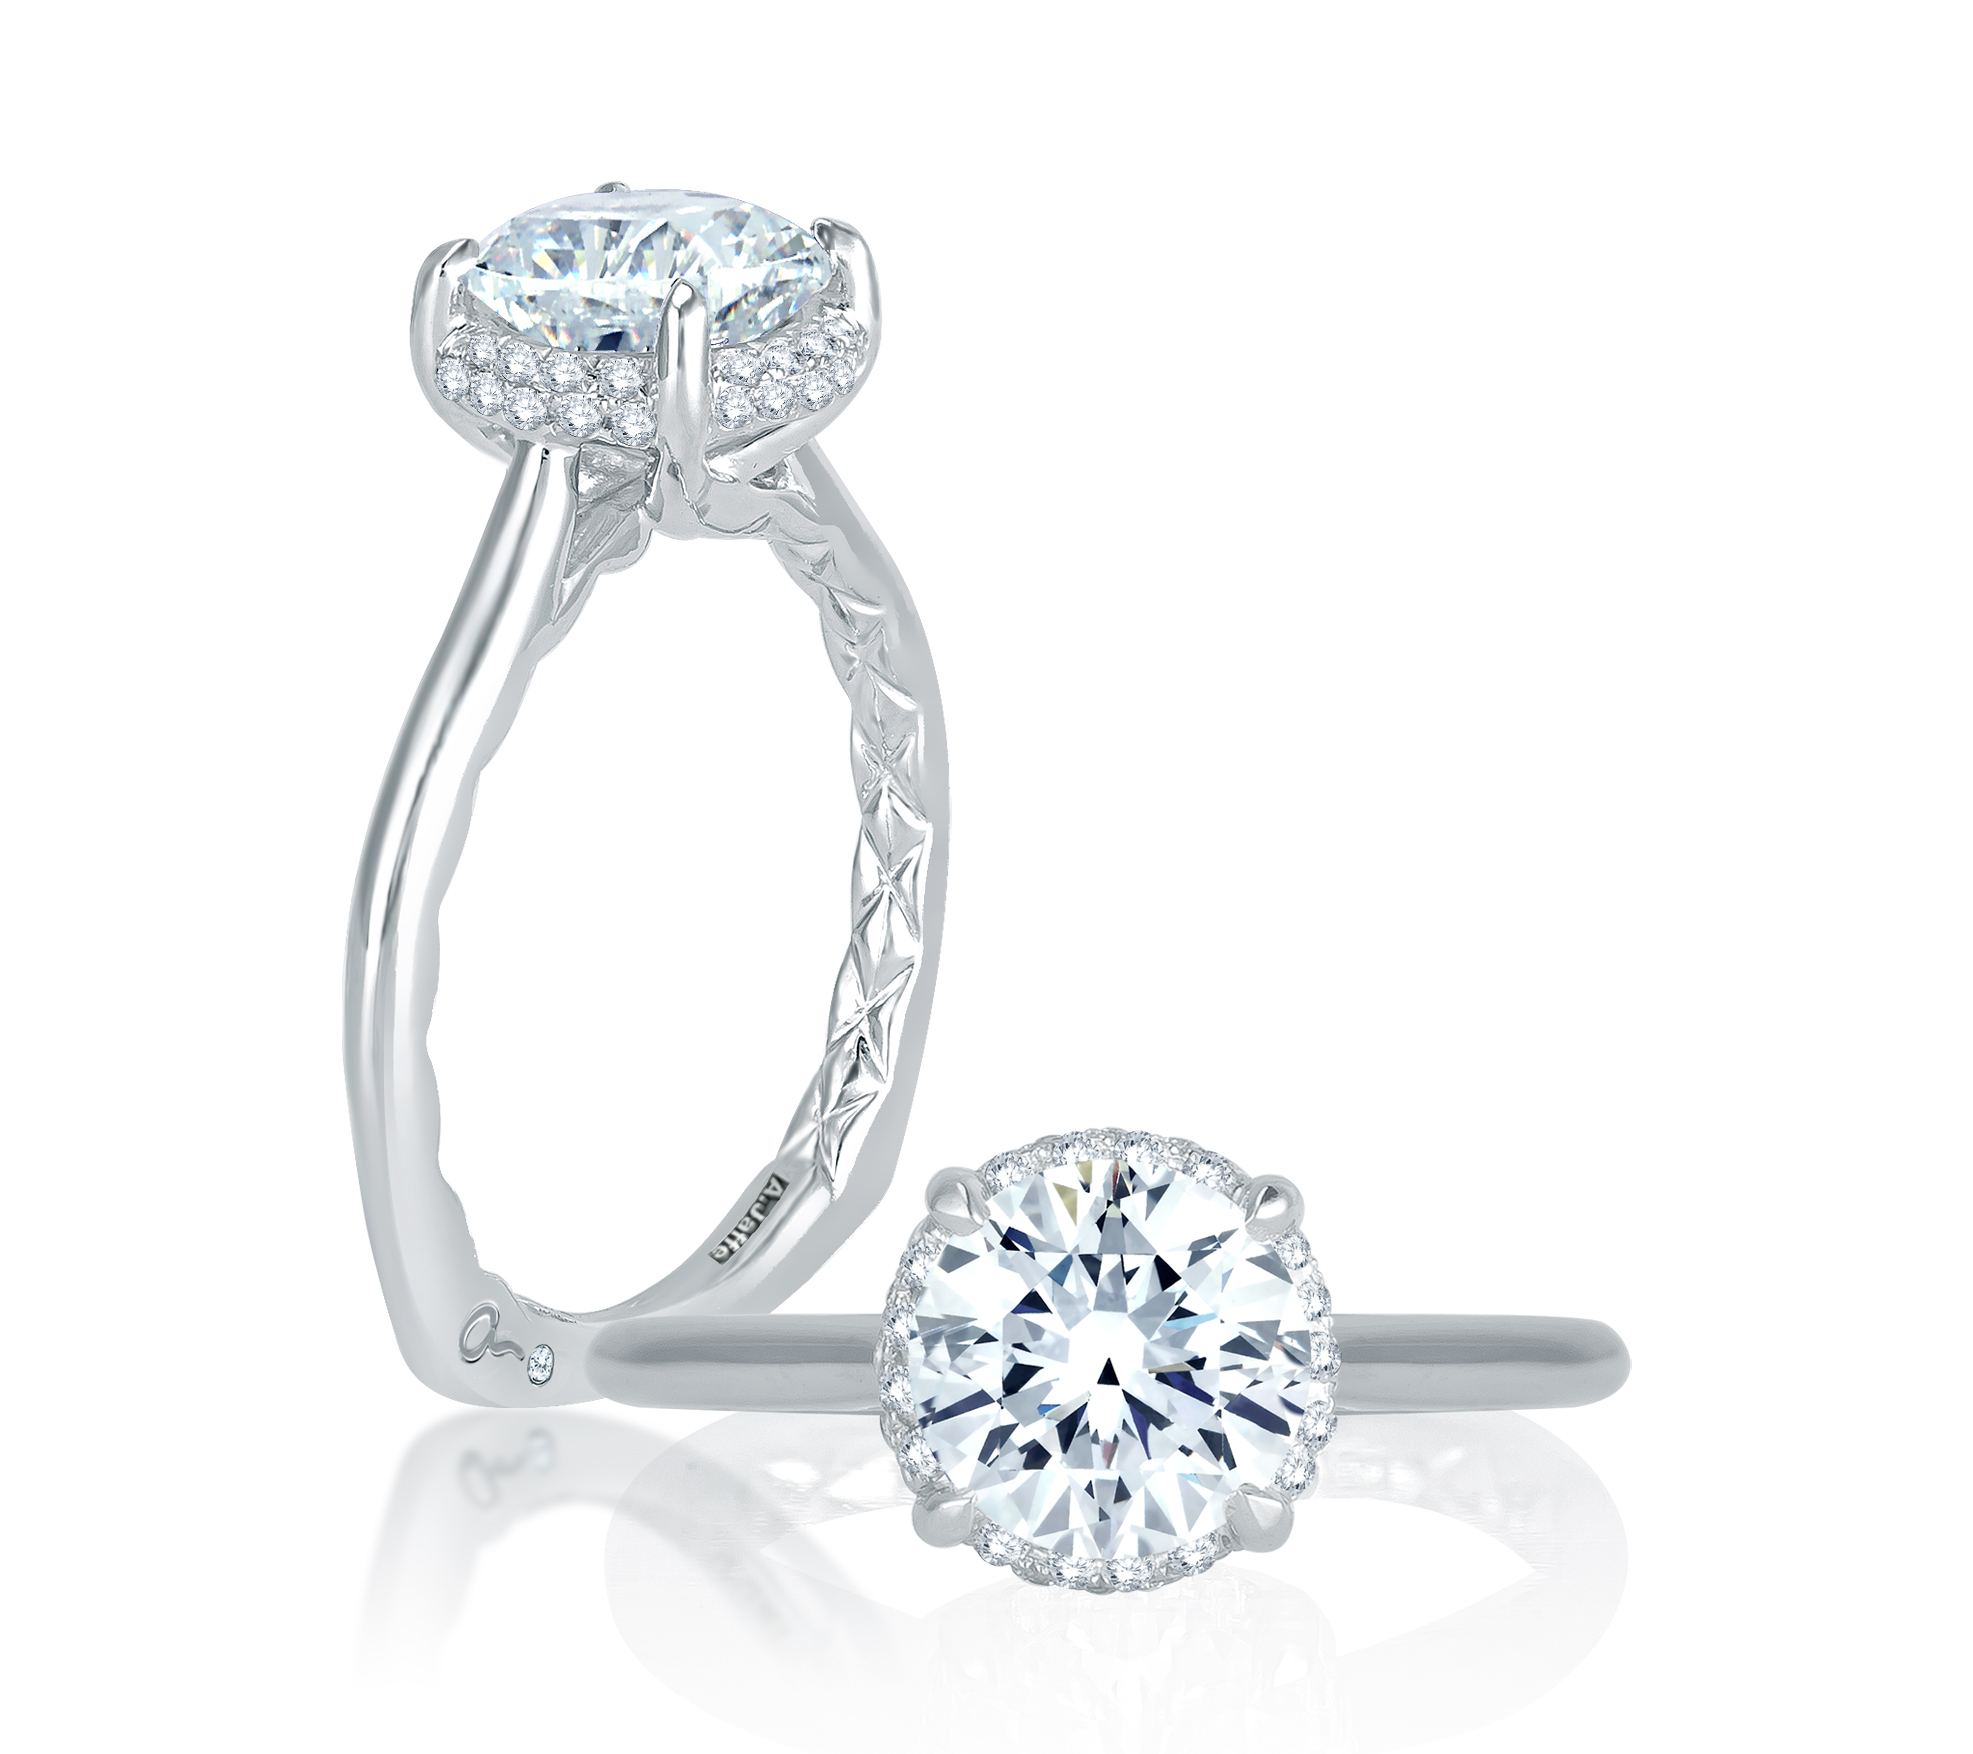 Diamond Rings | Camarillo, CA | Van Gundys